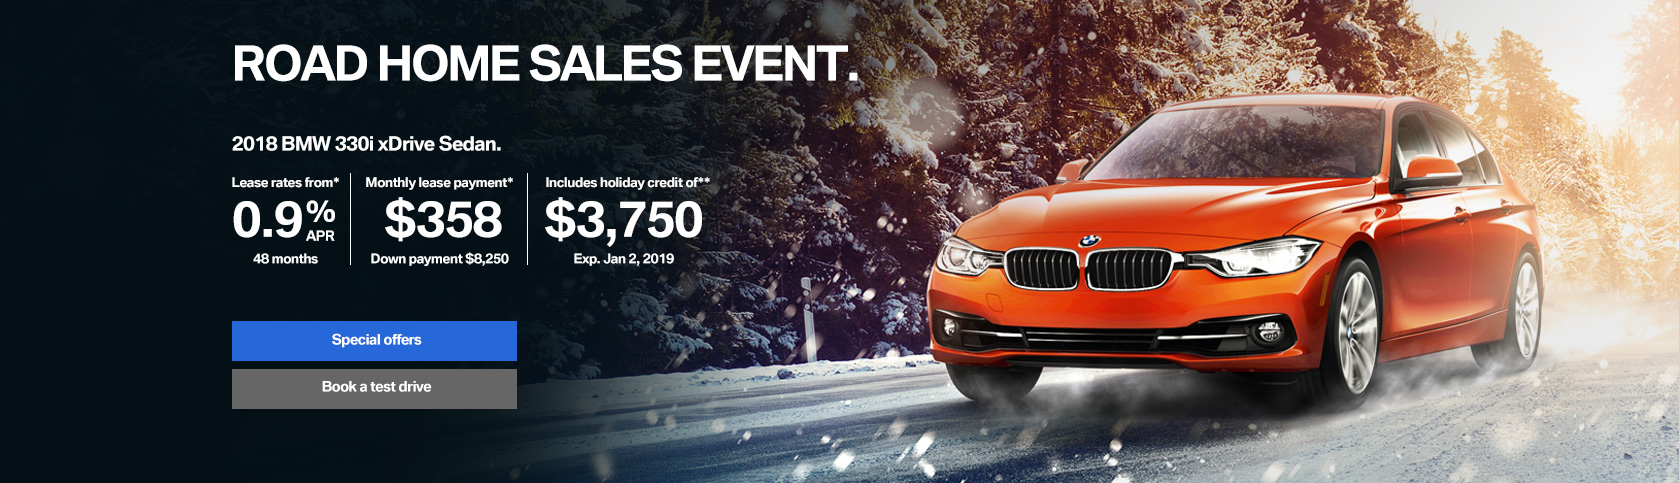 2018_BMW_DecDAG_3er_Banner_1679x483_GTA